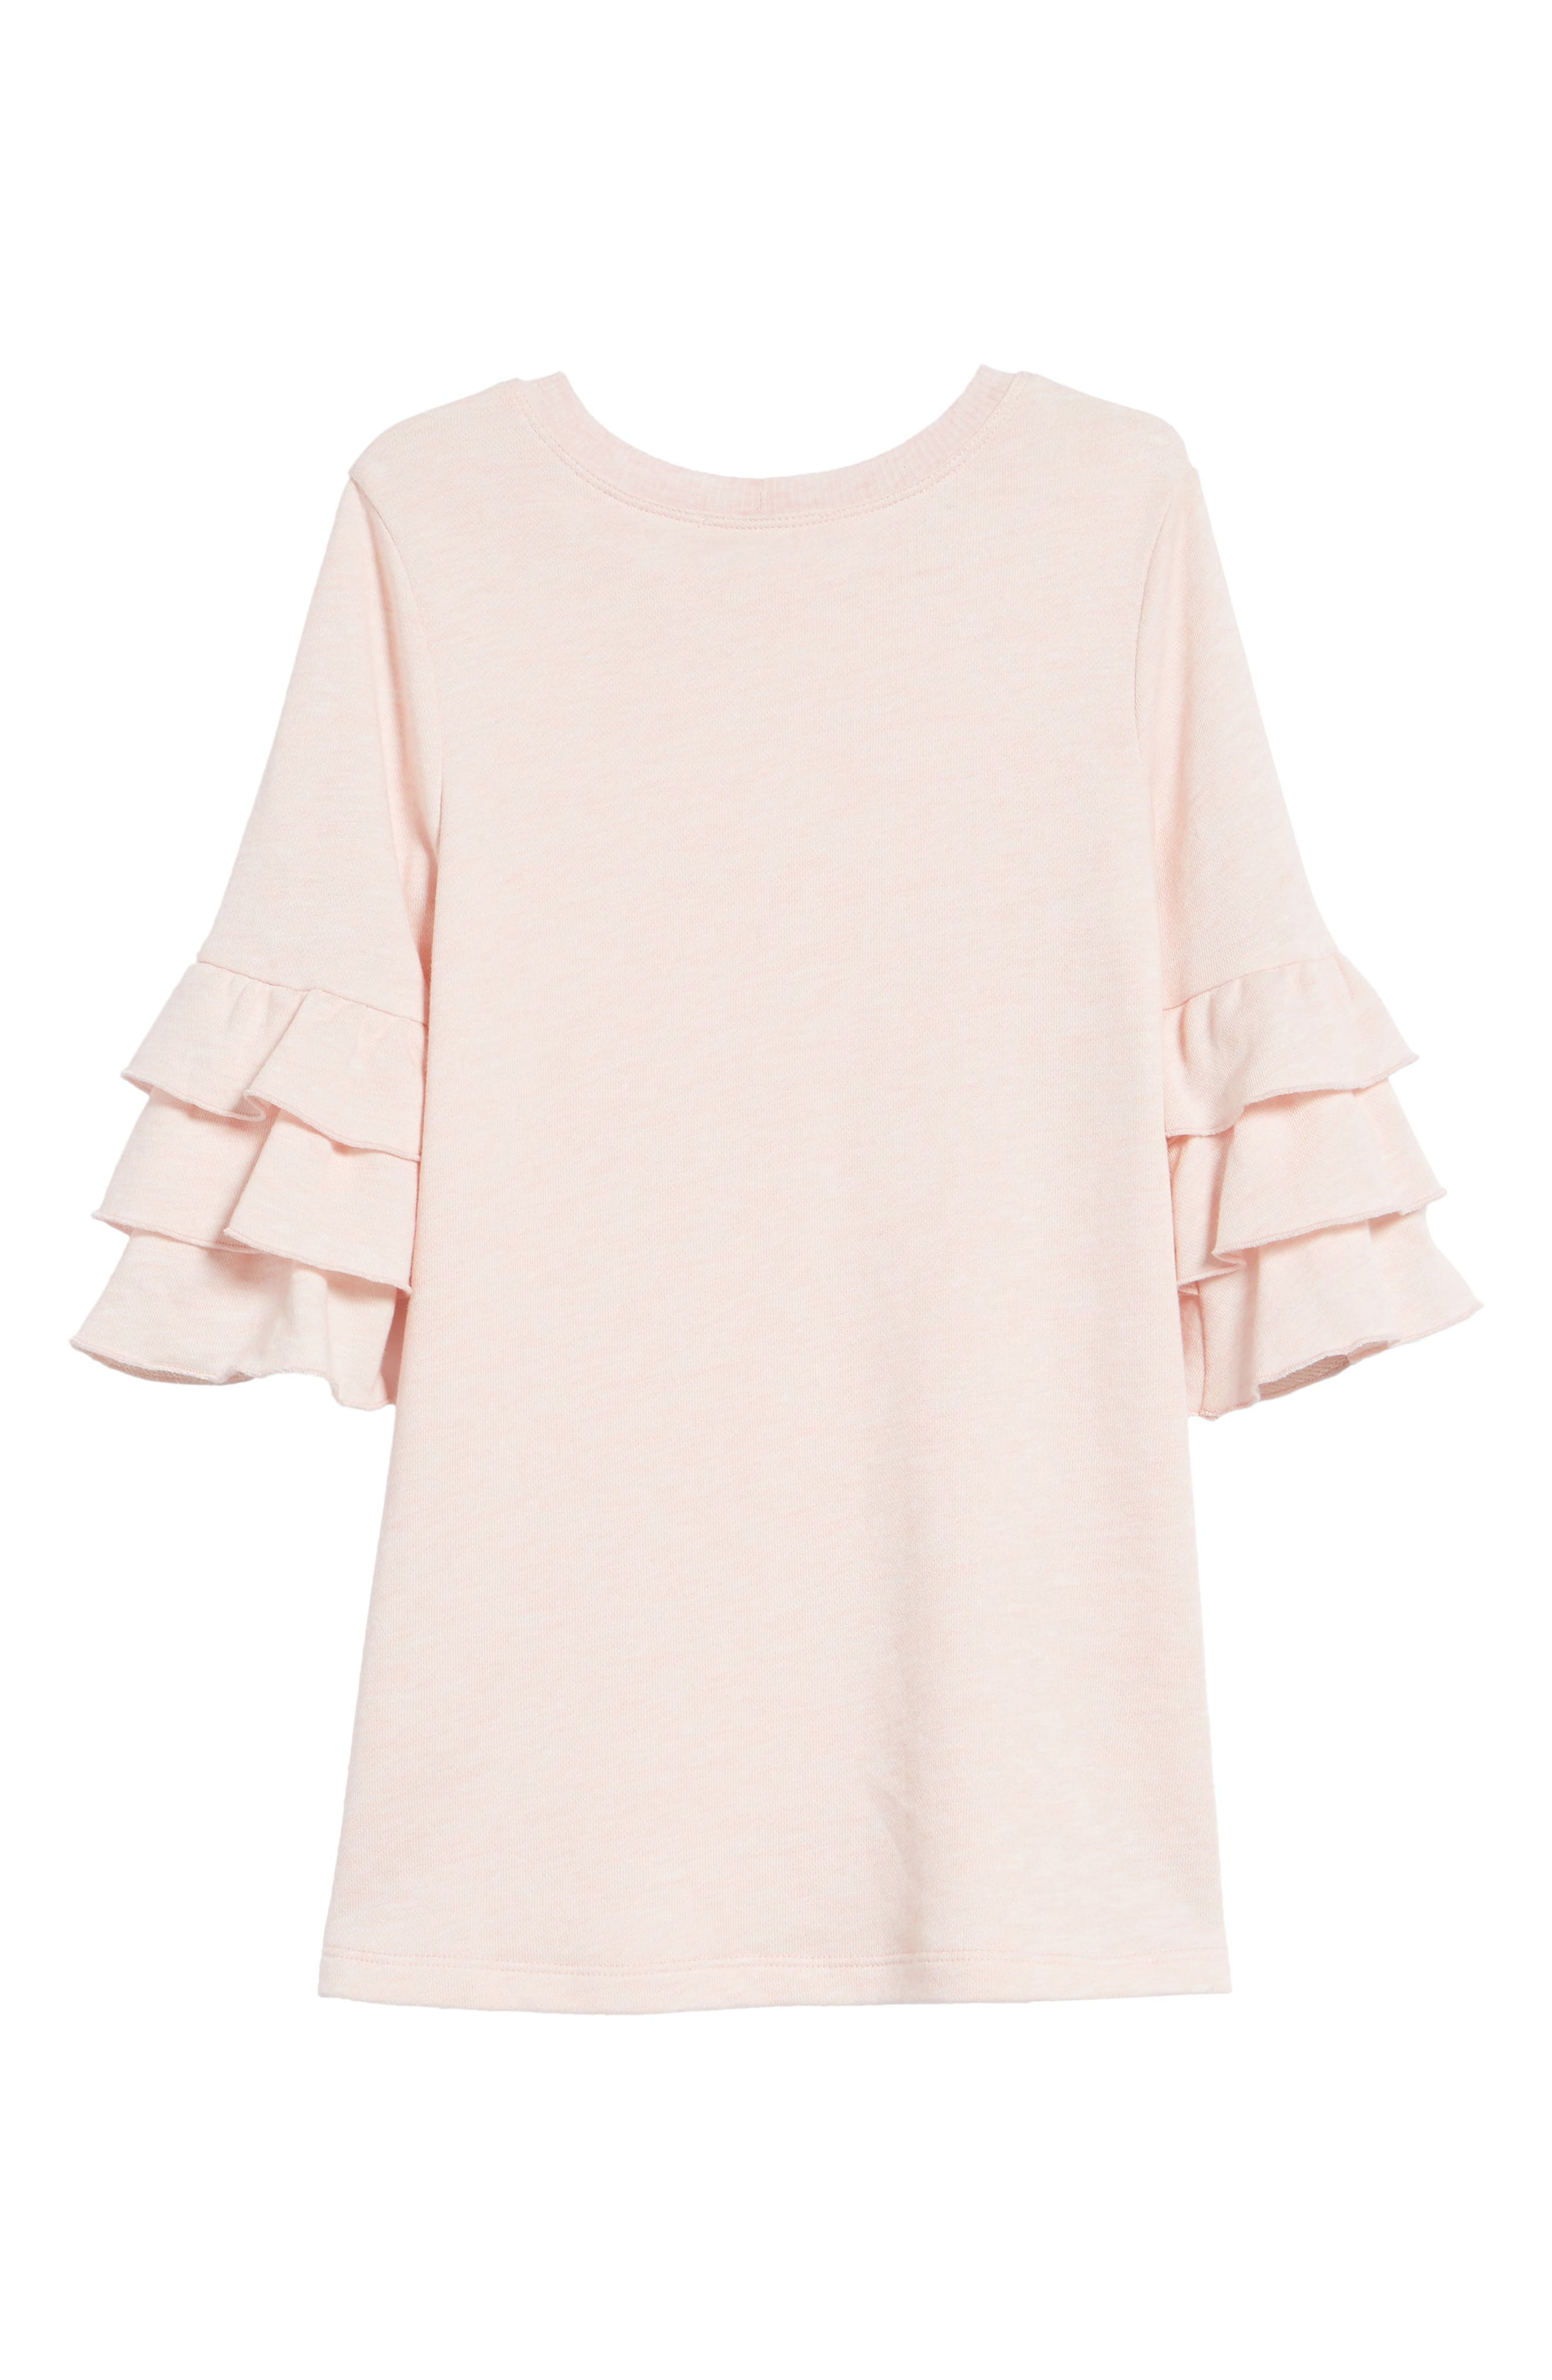 Alternate Image 2  - Truly Me Ruffle Sleeve Dress (Toddler Girls & Little Girls)